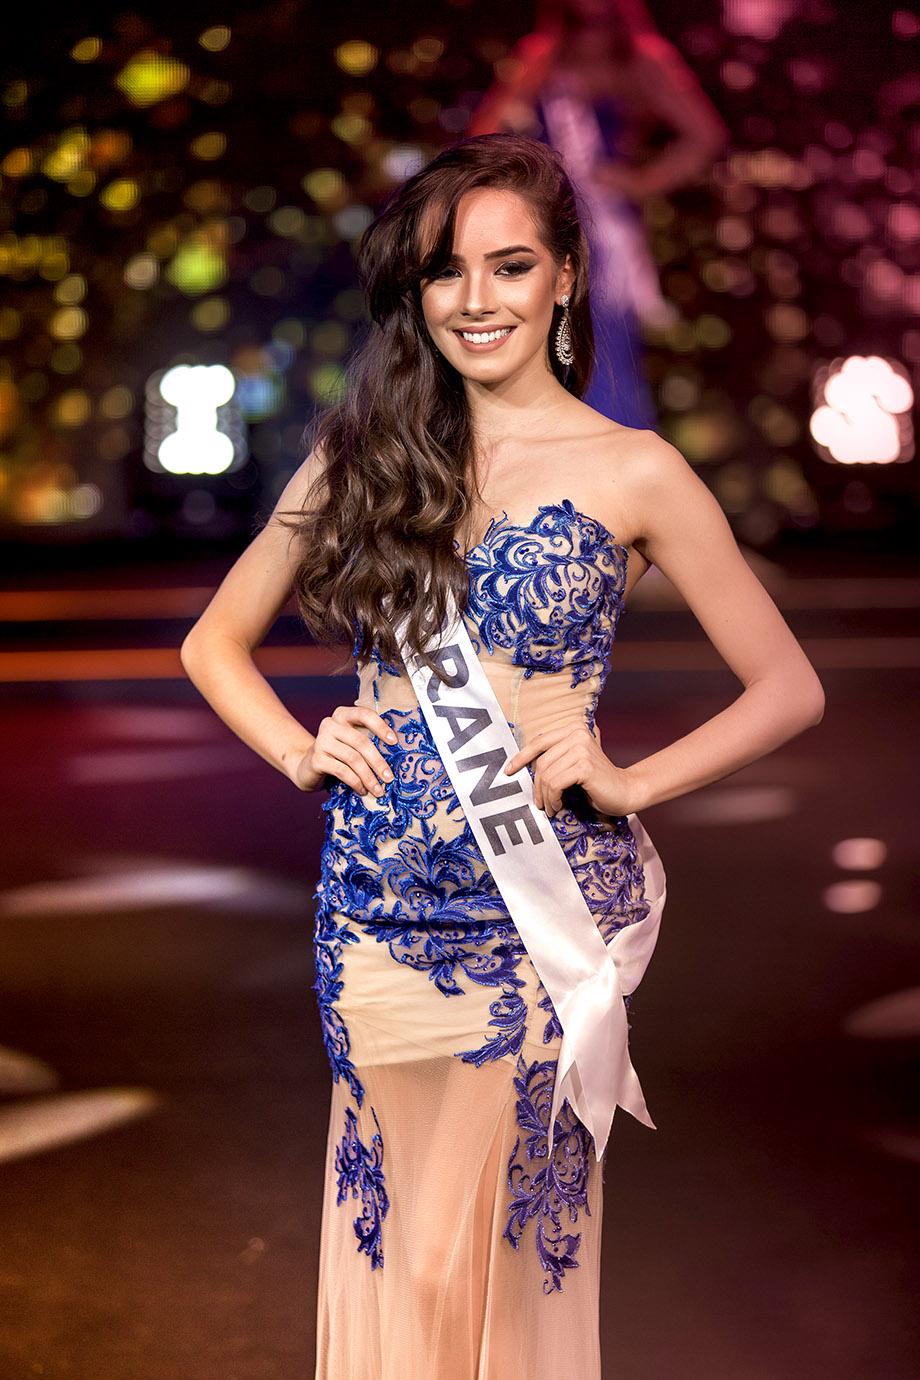 Blog Cris Moreira - Miss Fortaleza 2016 - 18